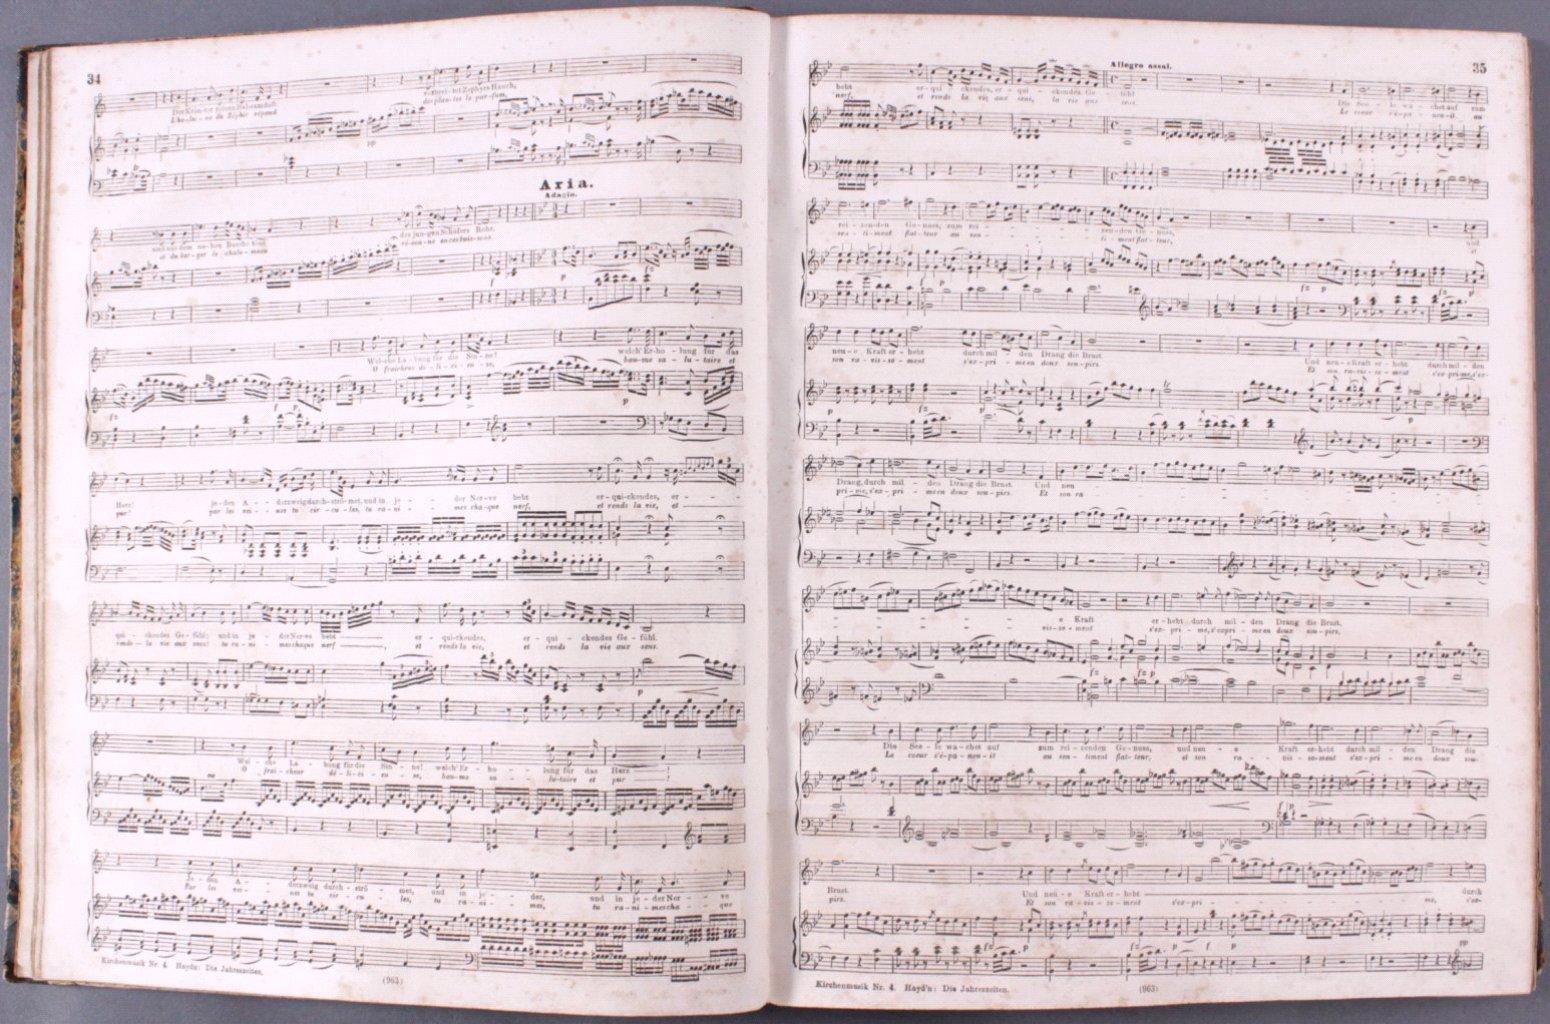 F.W. Markull. Kirchen-Musik-2